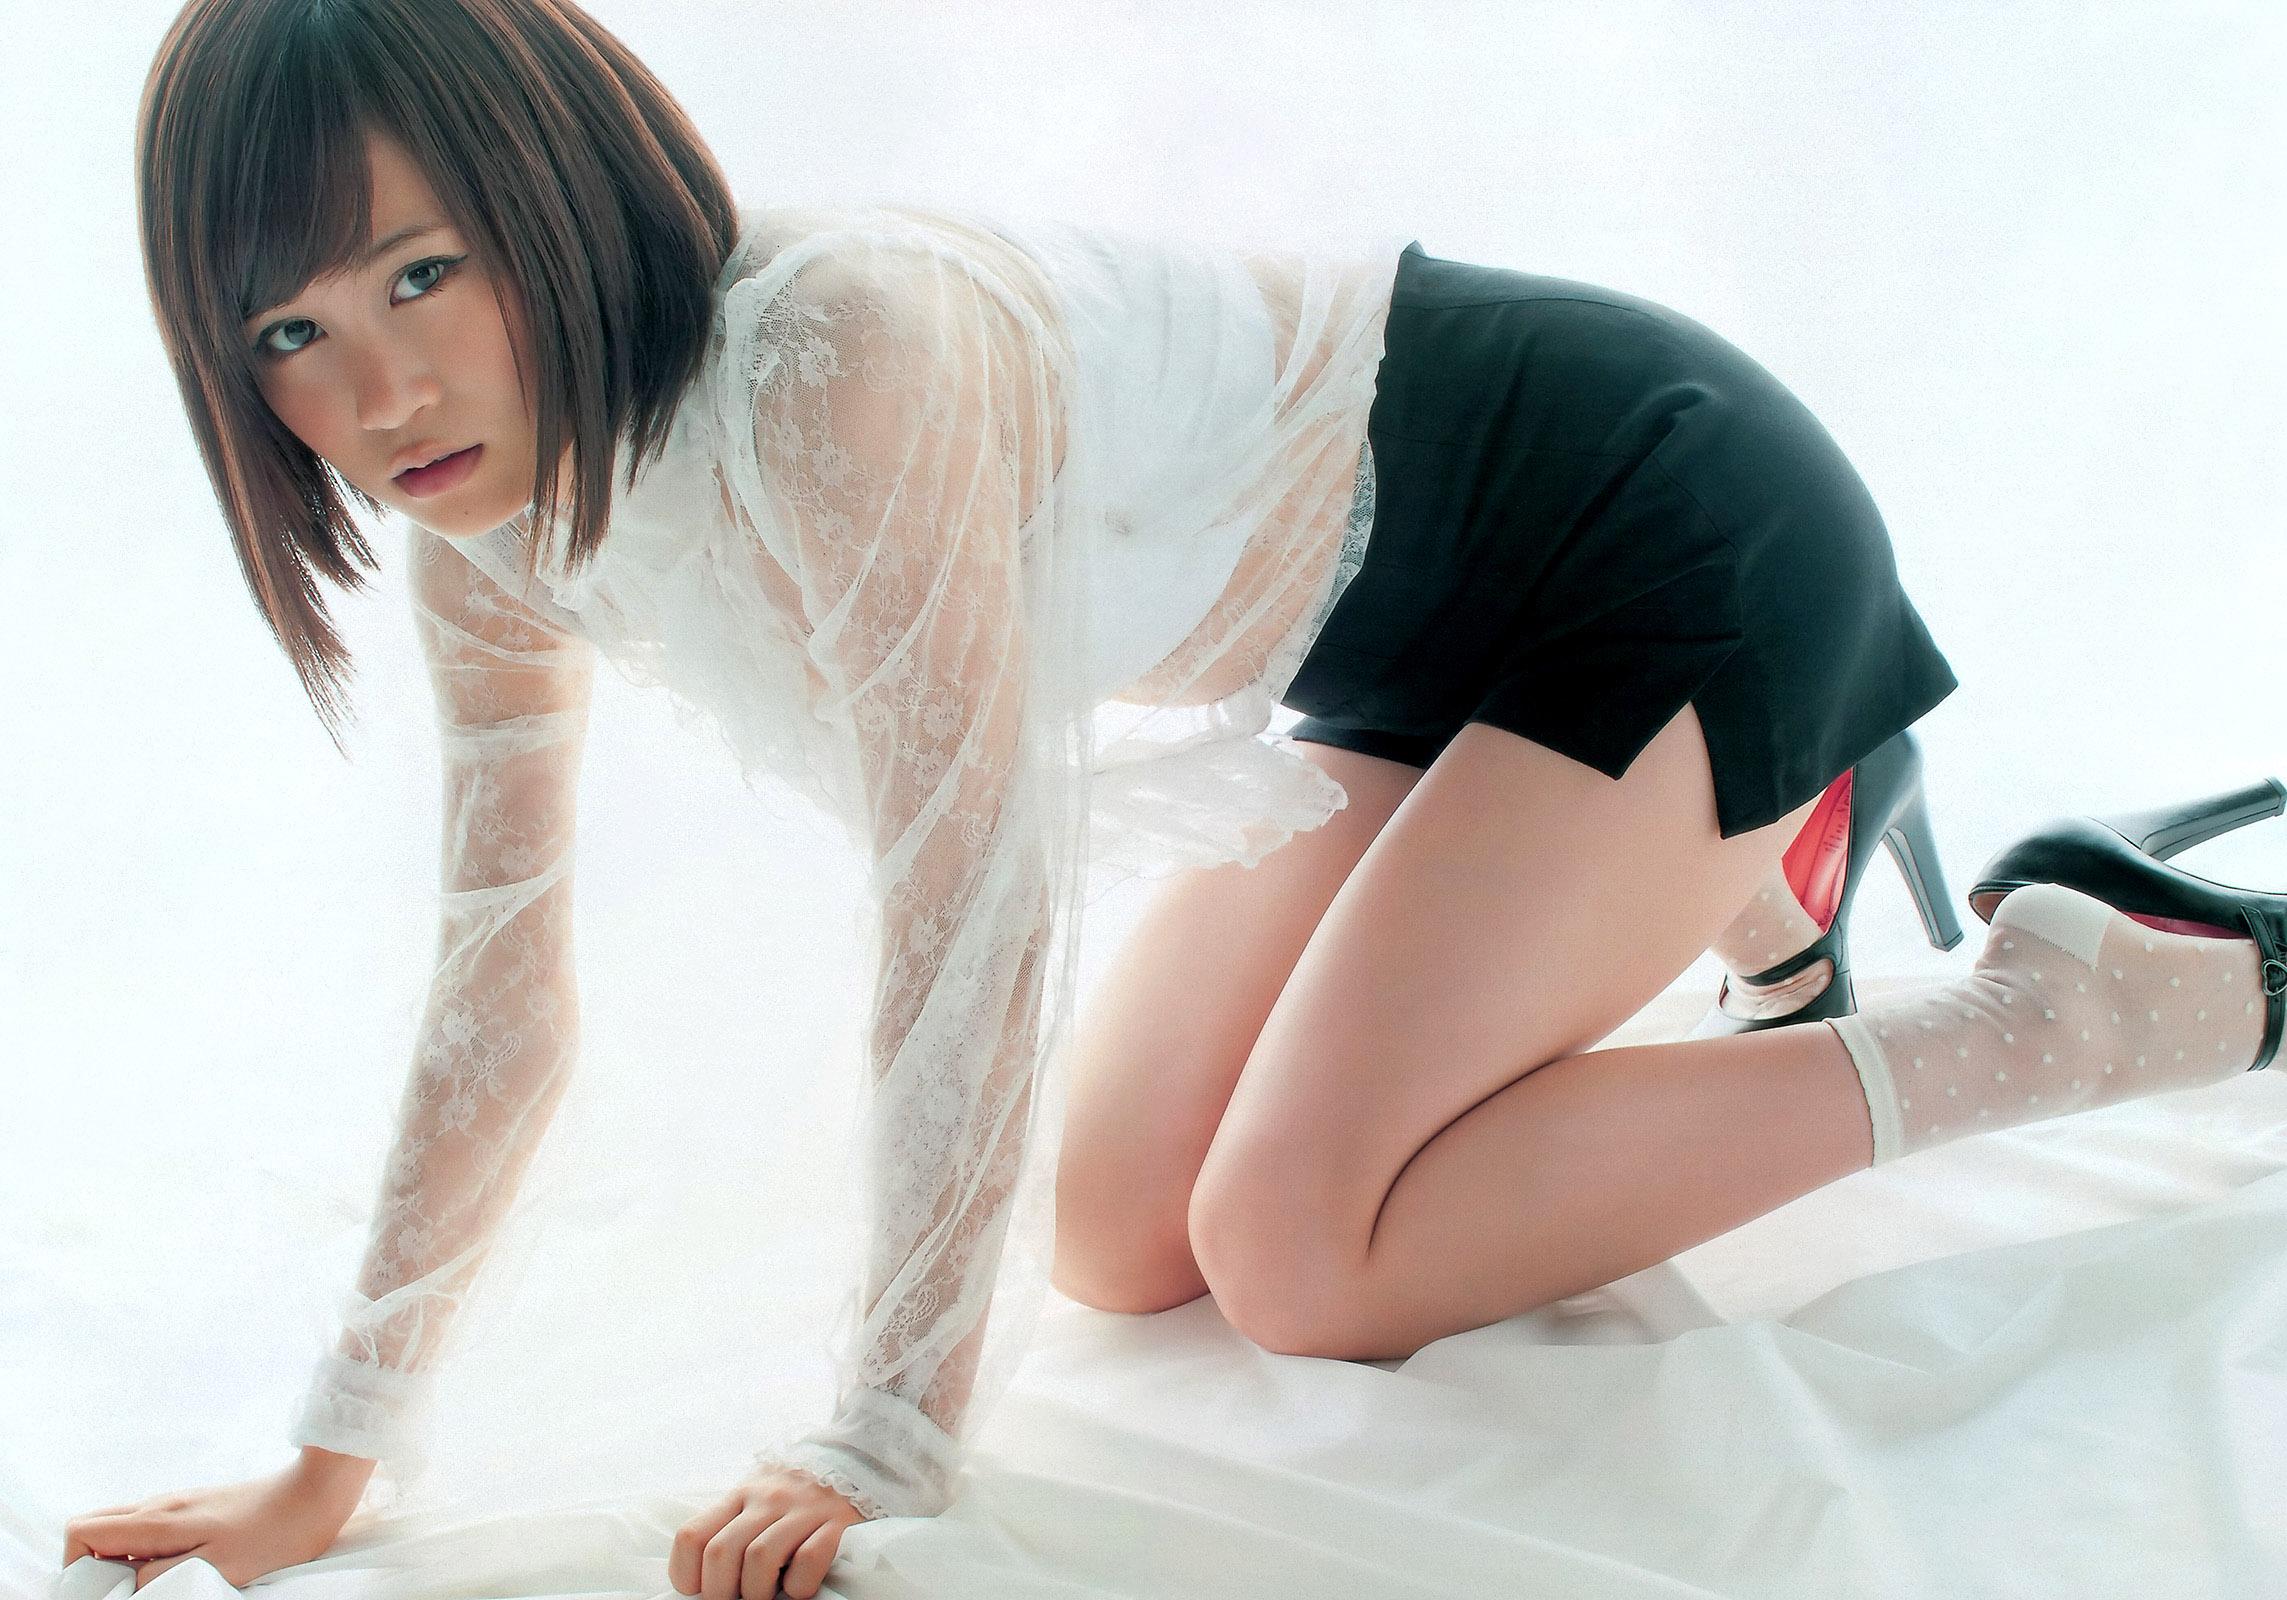 MAtsuko WPB 120103 05.jpg